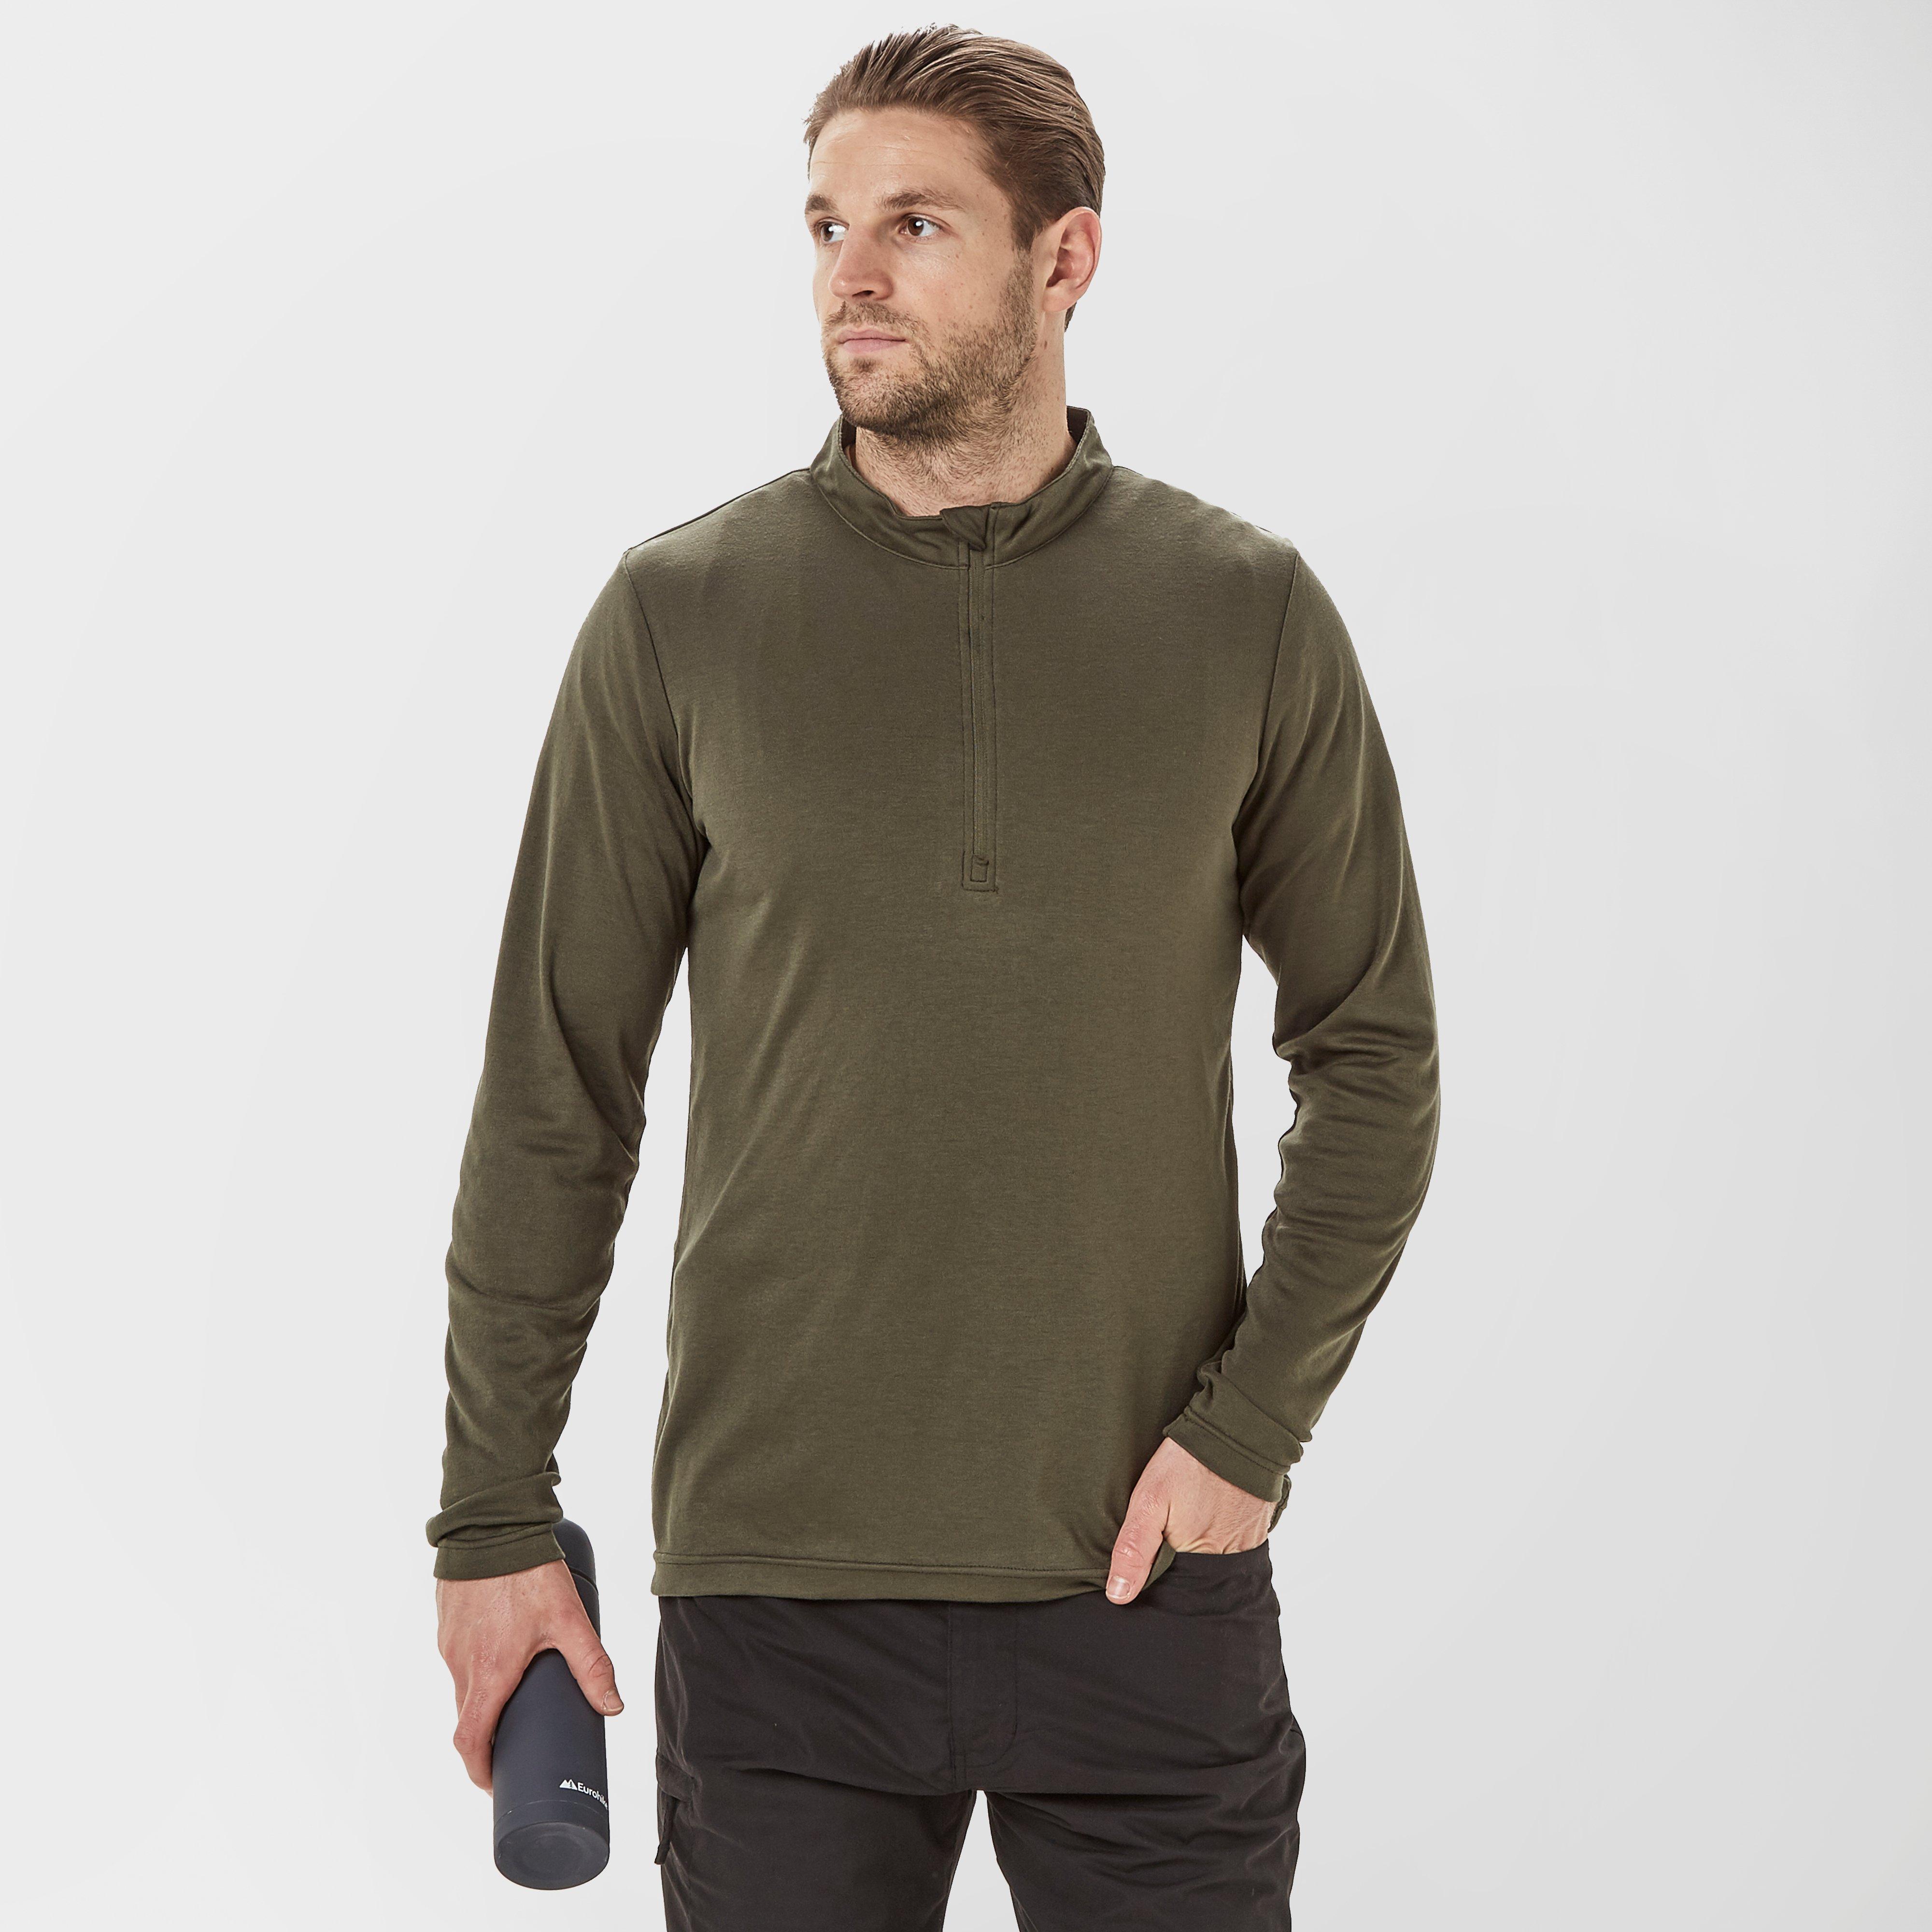 Peter Storm Mens Long Sleeve Thermal Zip Baselayer - Khaki/khk  Khaki/khk